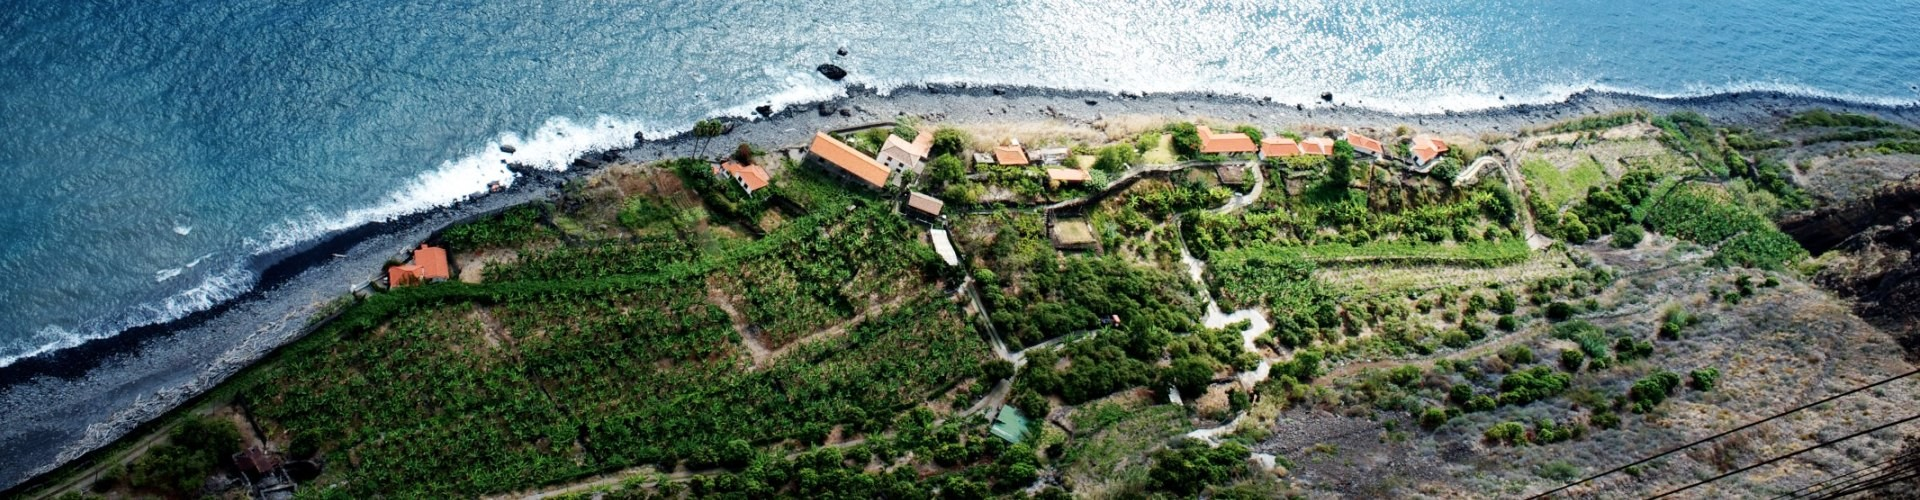 Miradouro Faja dos Padres Viewpoint, Madeira